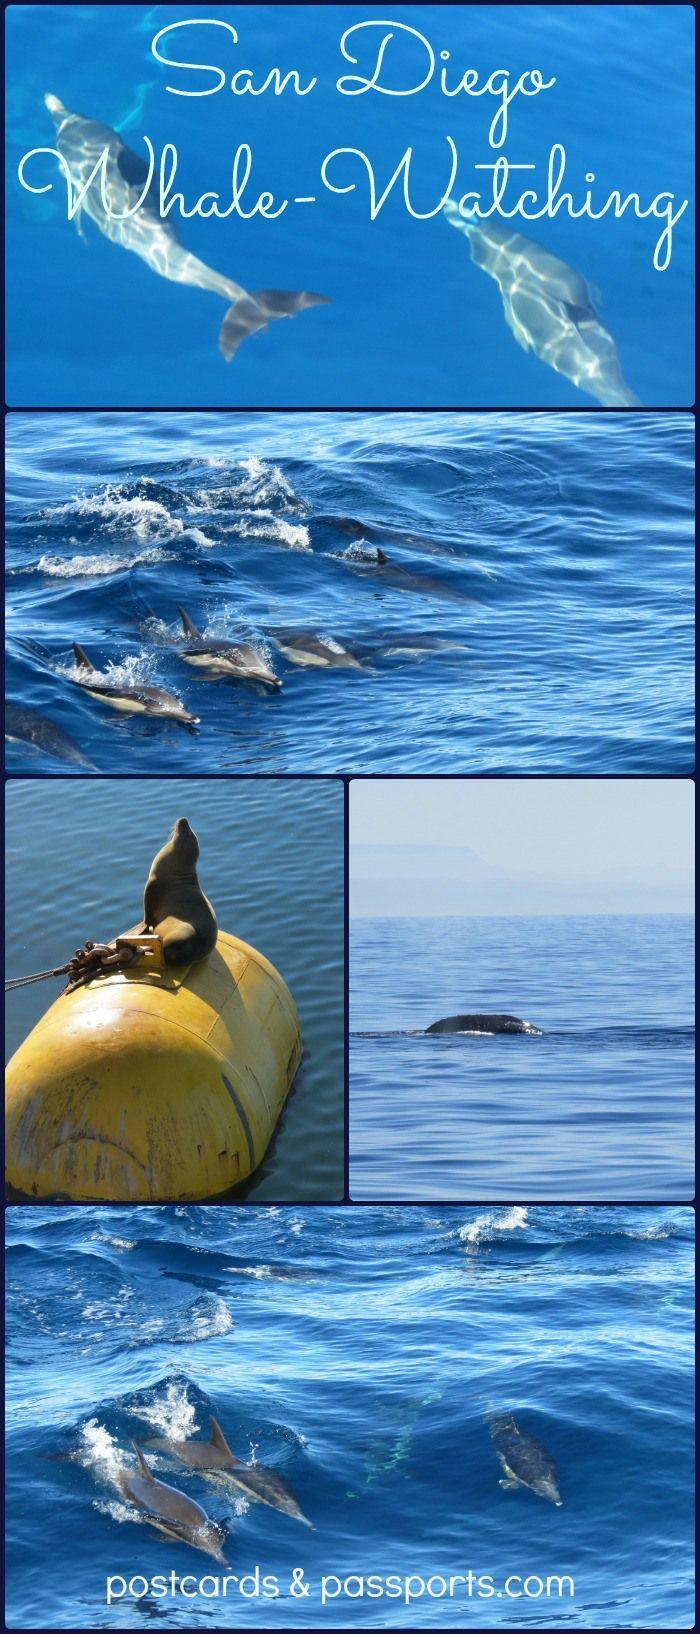 San Diego Whale-Watching - Postcards & Passports: